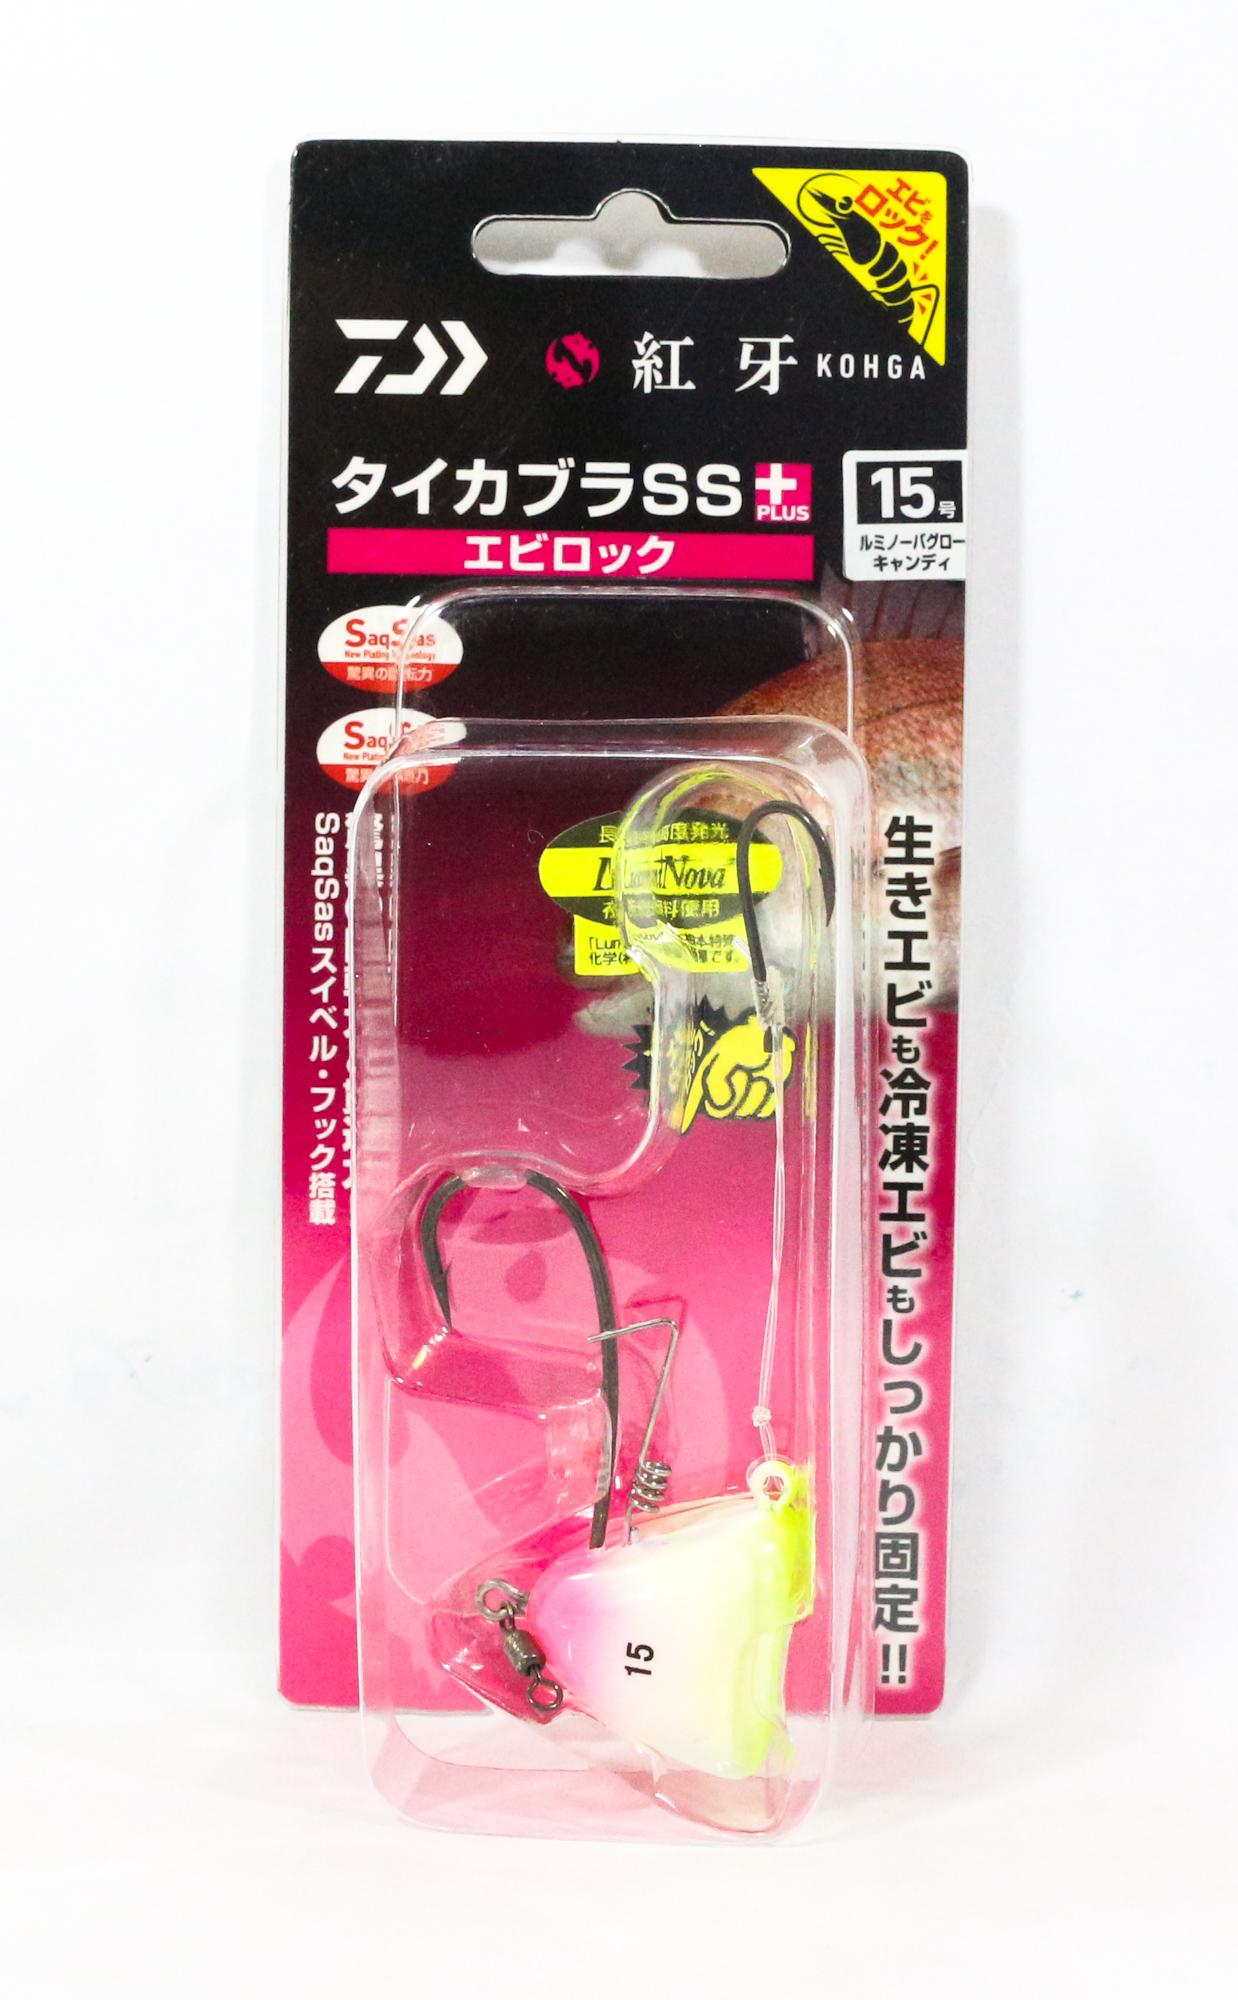 Daiwa Kabura SS+ Tenya Jig Size 15 L Glow Candy 003264